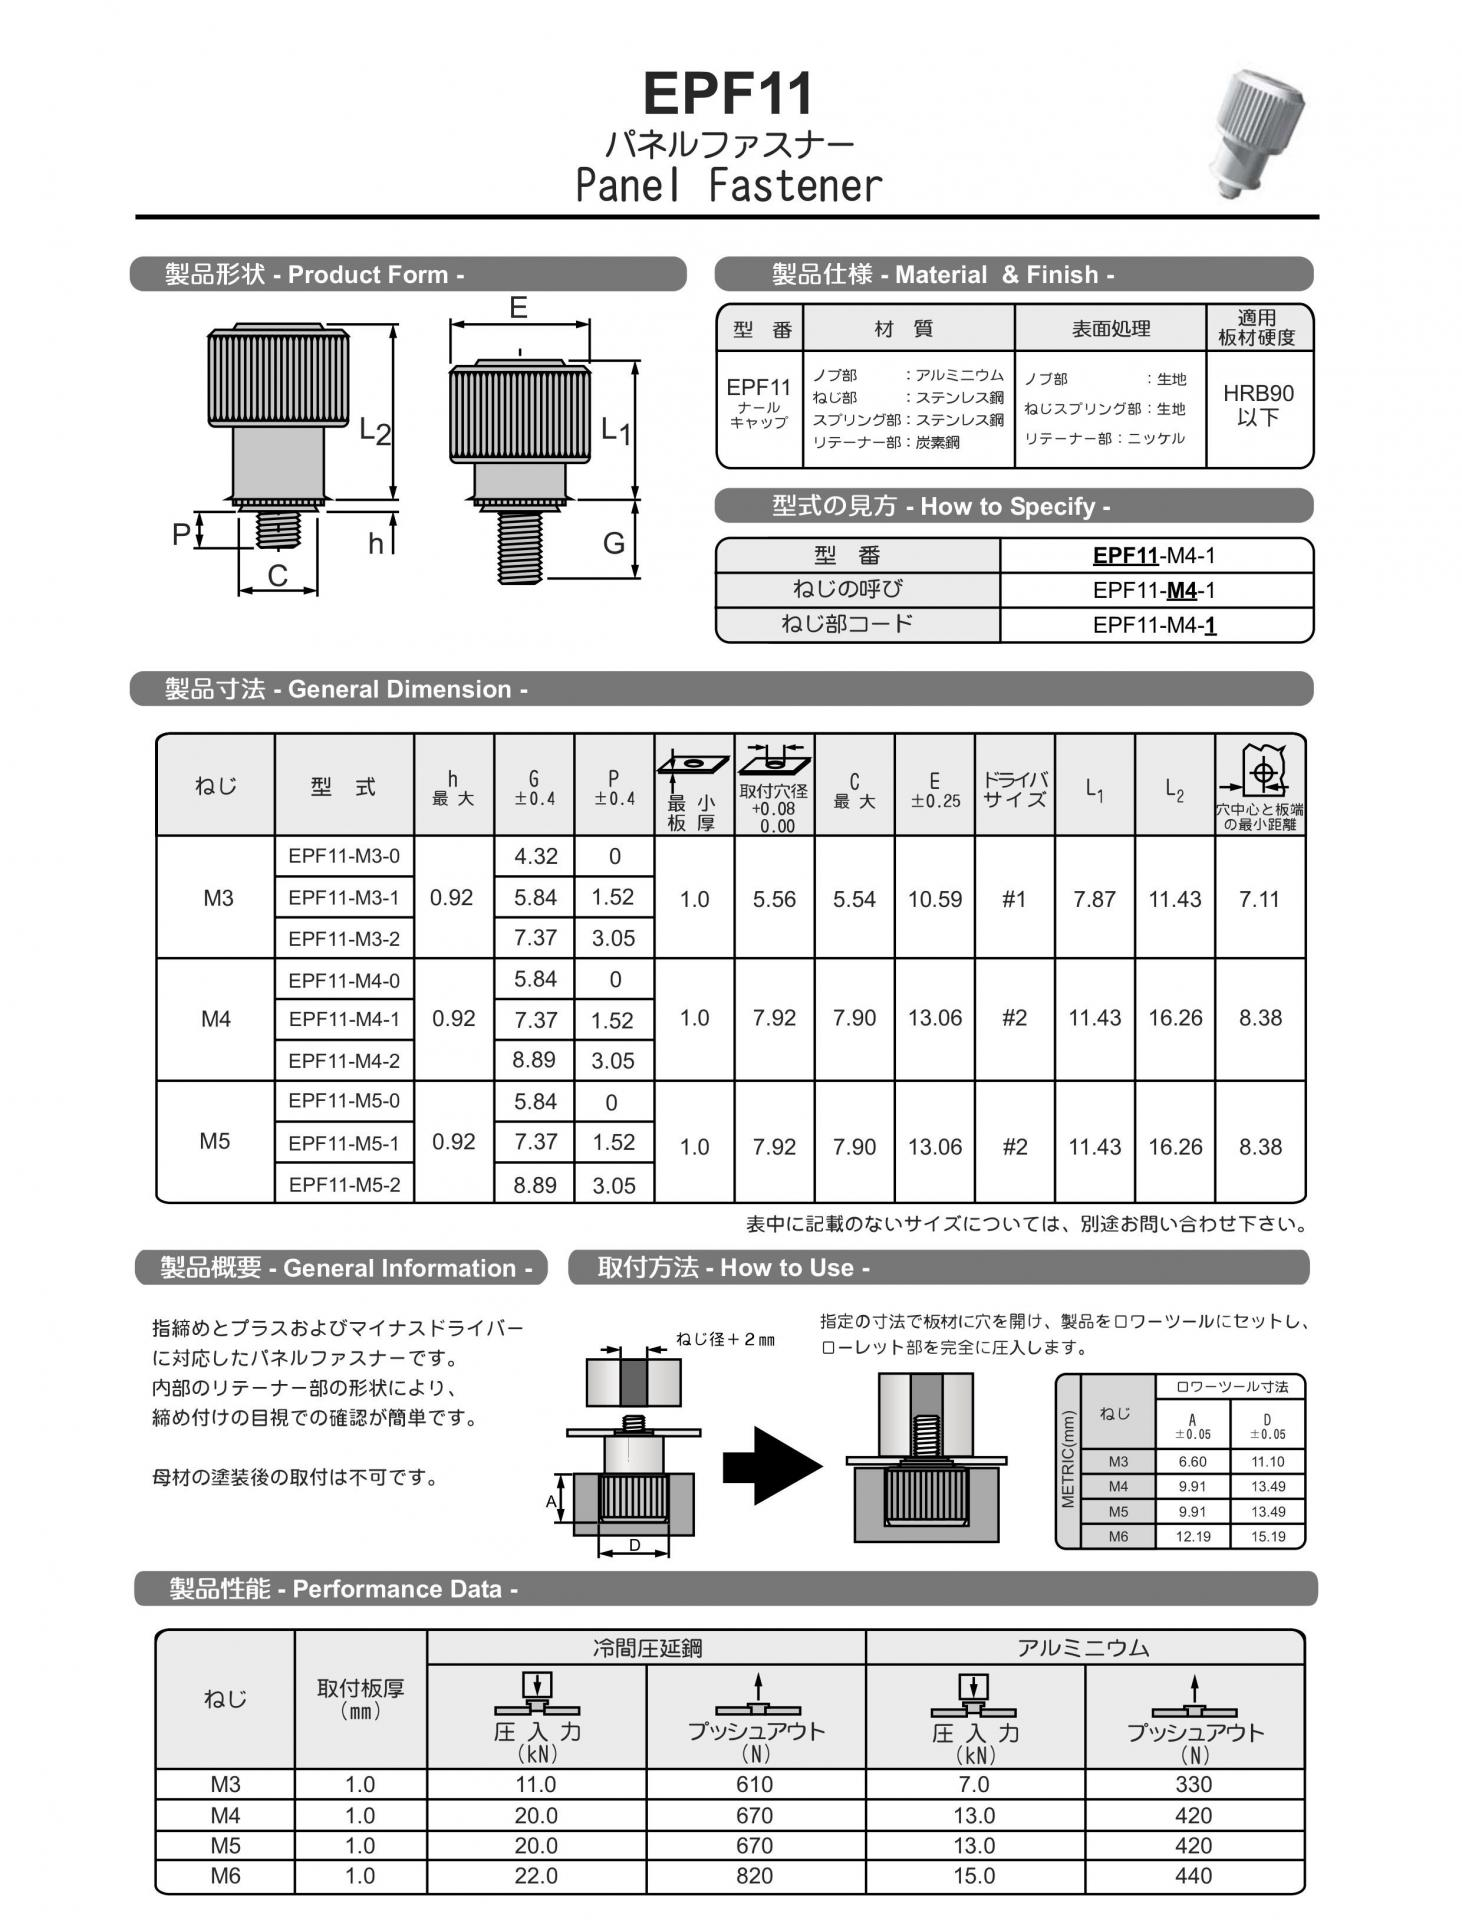 Panel Fastener (EPF11)